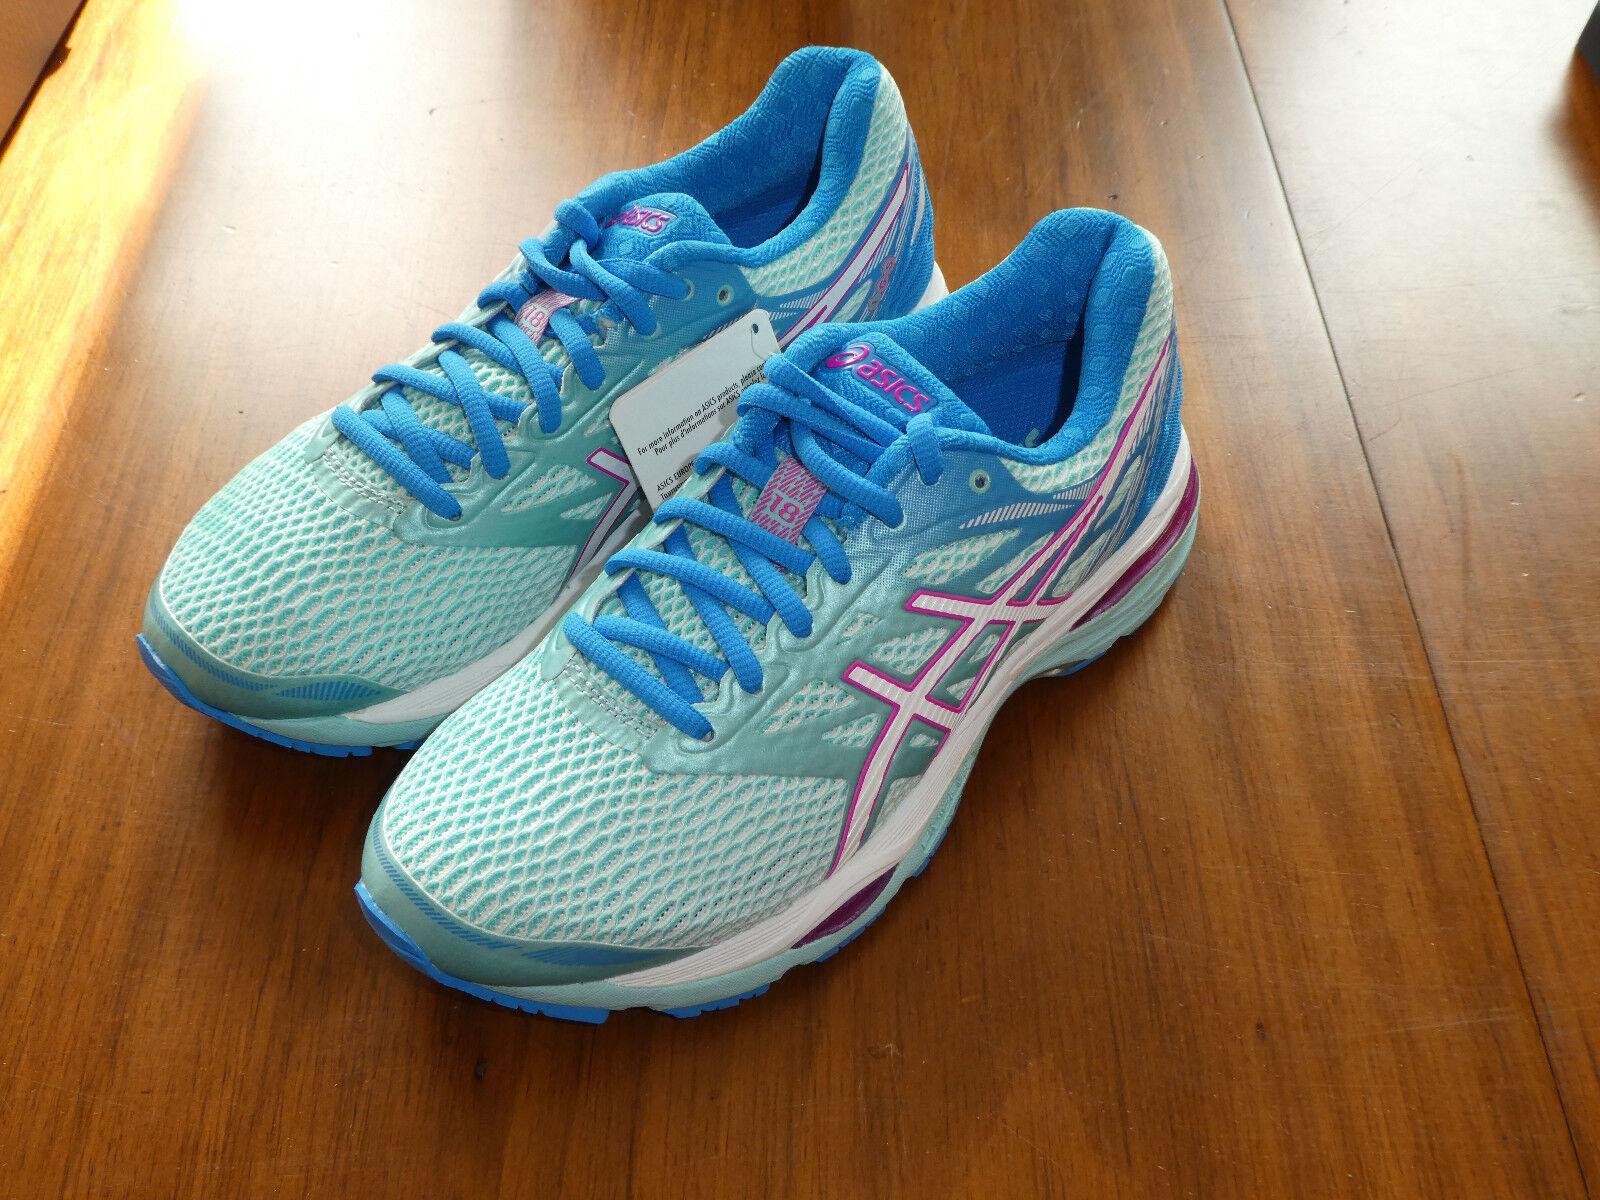 Asics Gel Cumulus 18 womens shoes T6C8N 6701 new sneakers running aqua splash